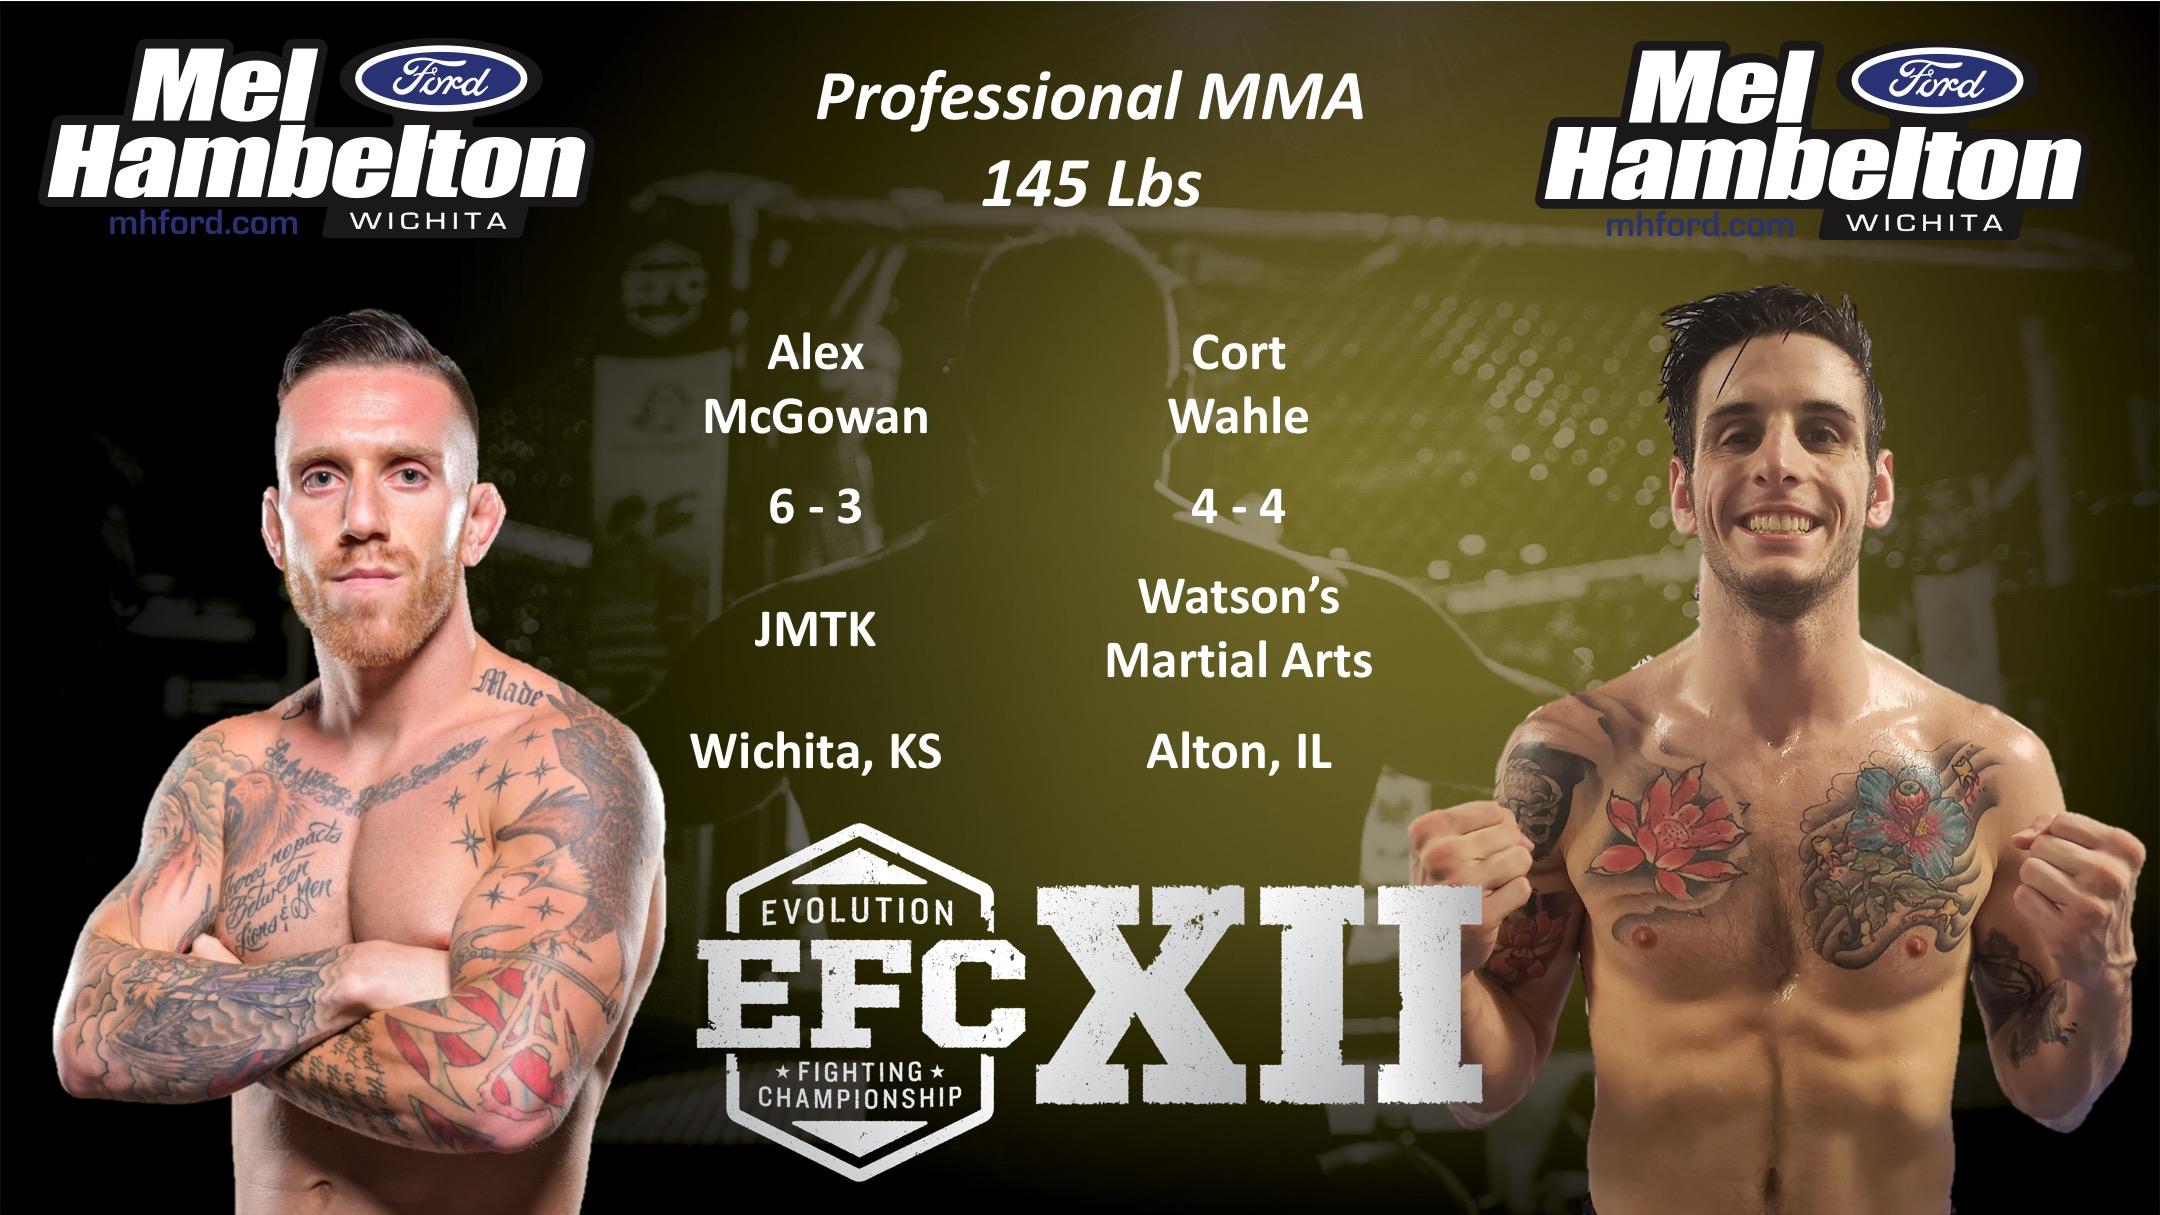 EFC12 Wahle vs McGowan.jpg